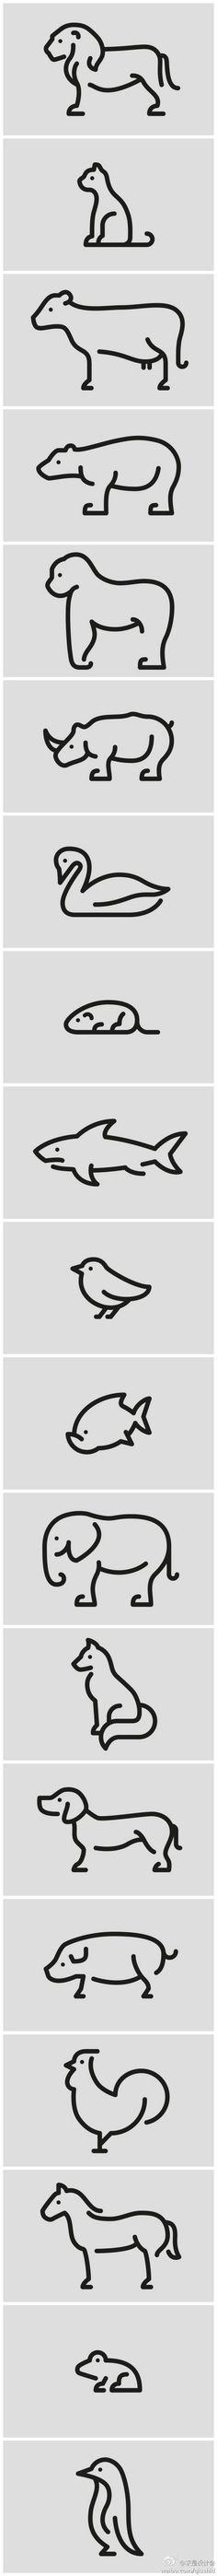 Pictograms via weibo - Do It Darling